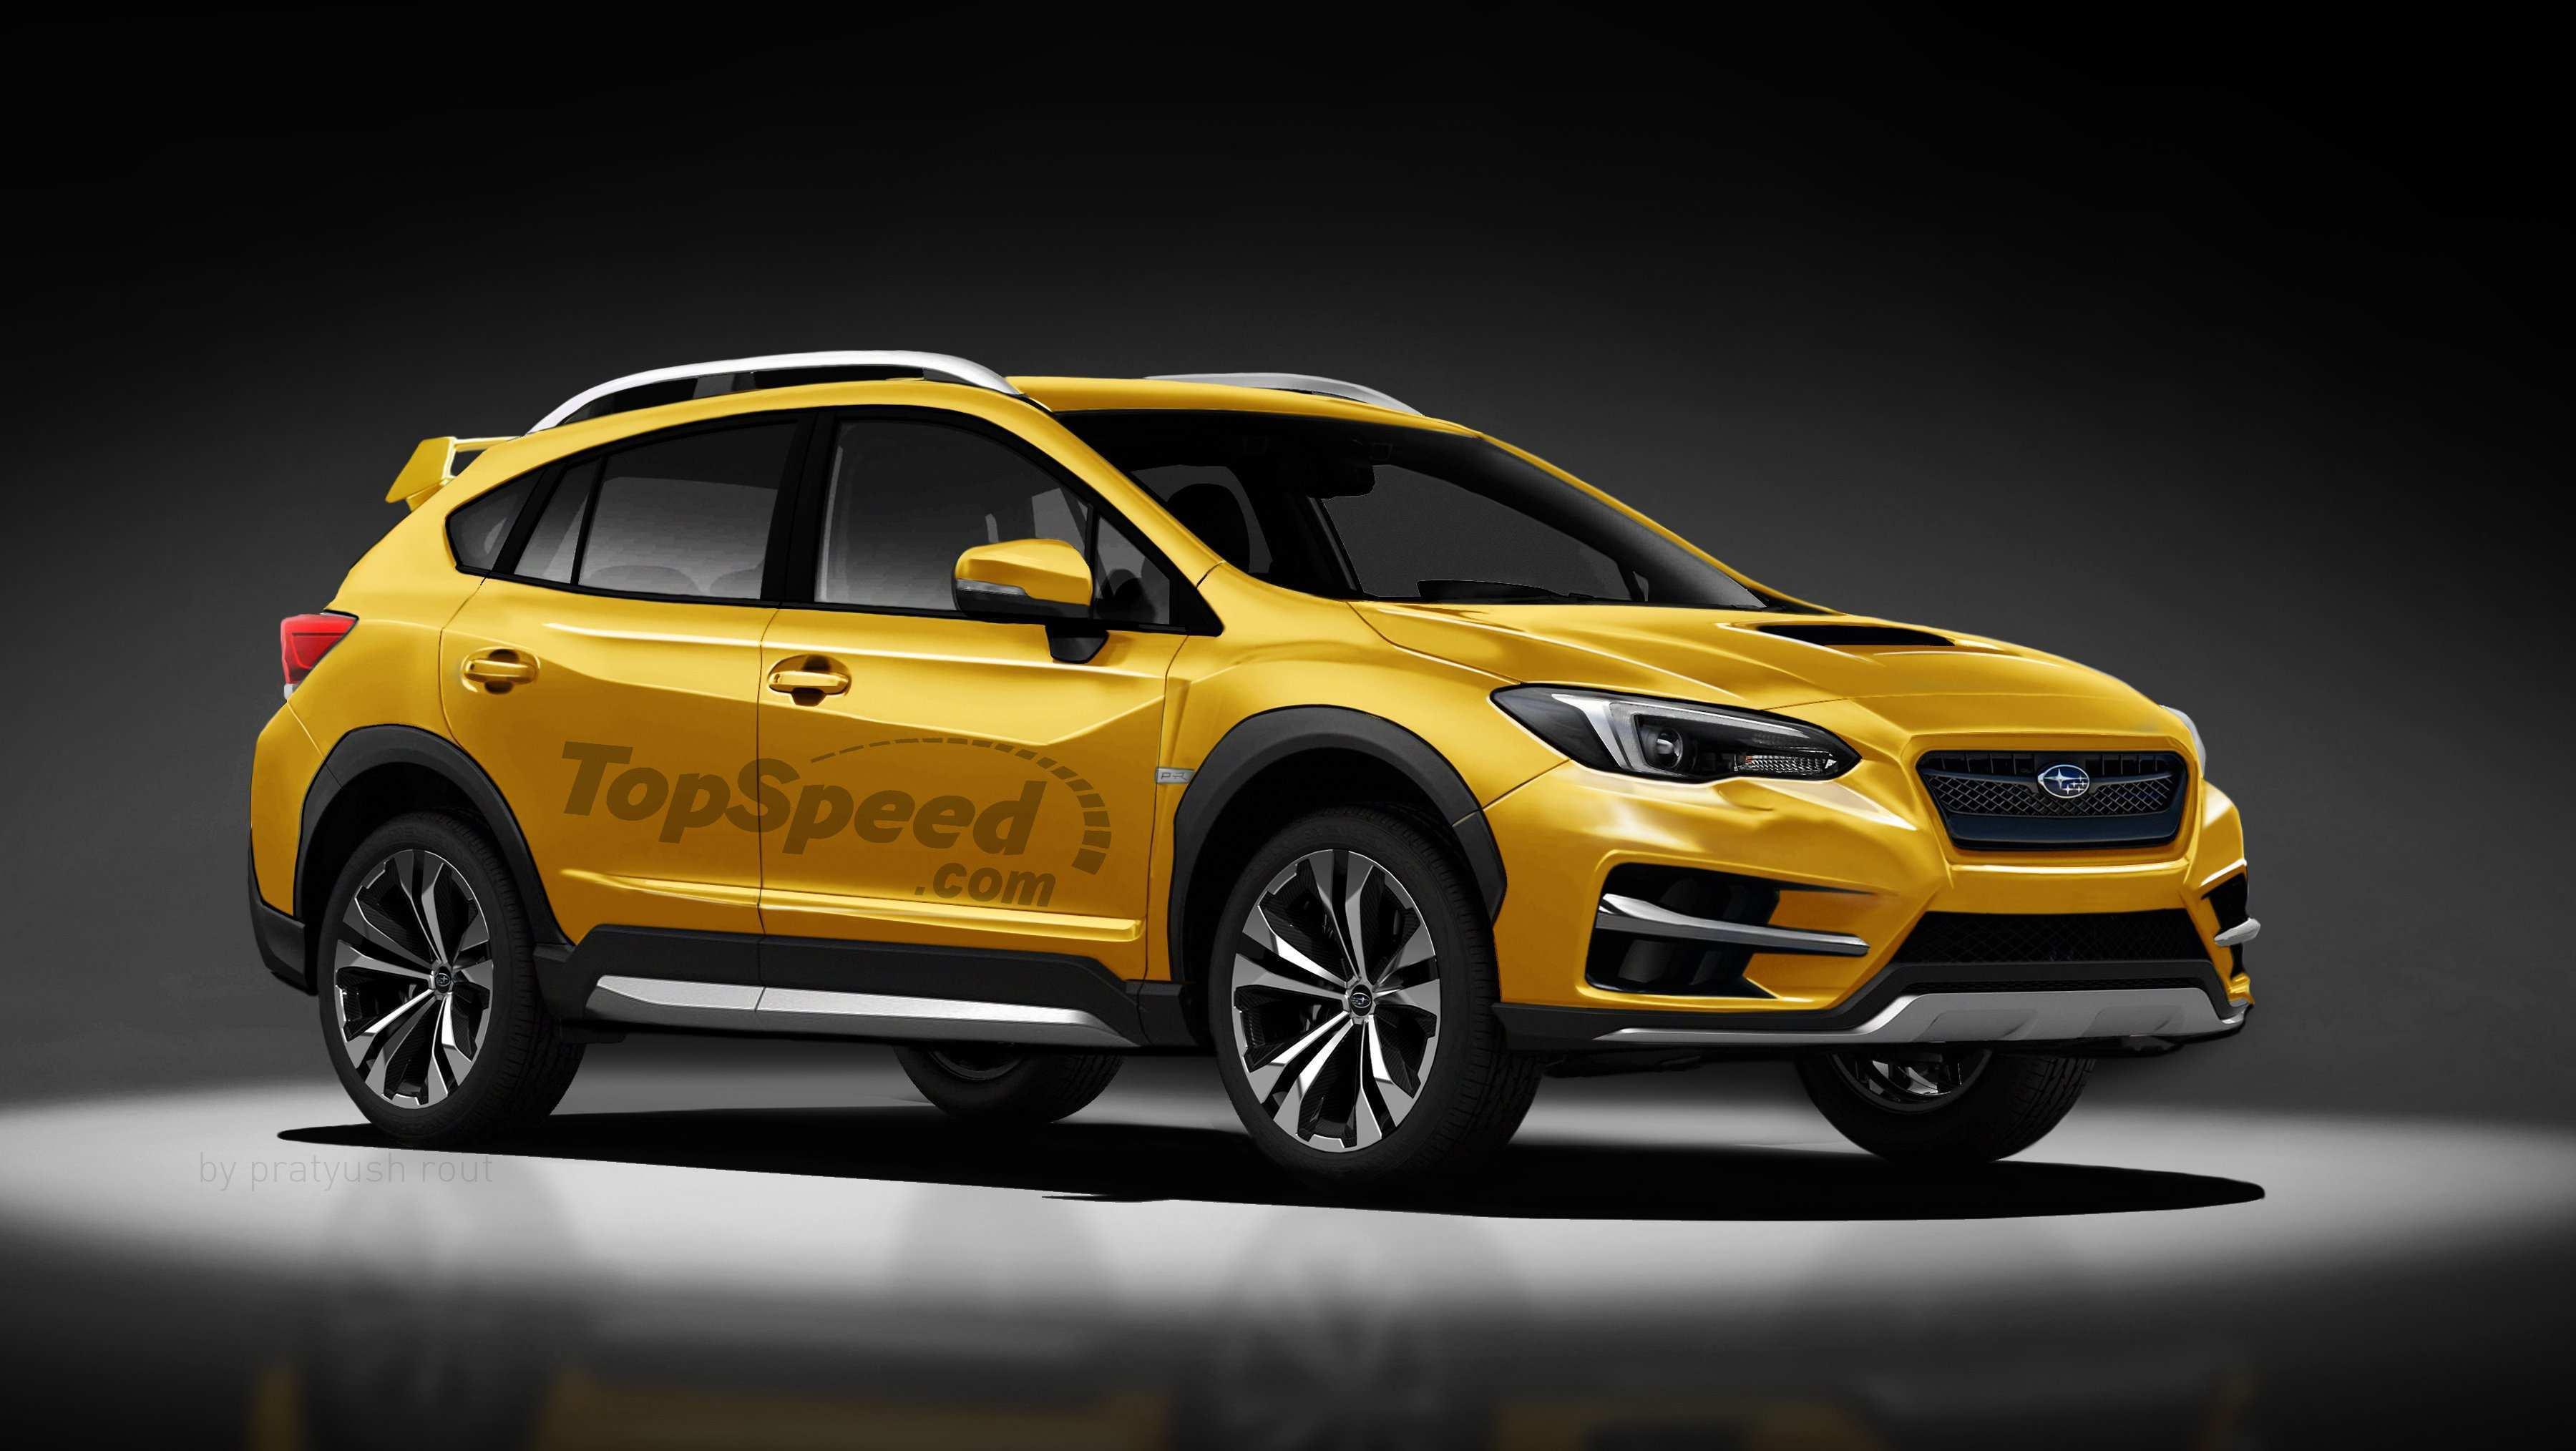 20 Concept of 2020 Subaru Lineup Interior with 2020 Subaru Lineup